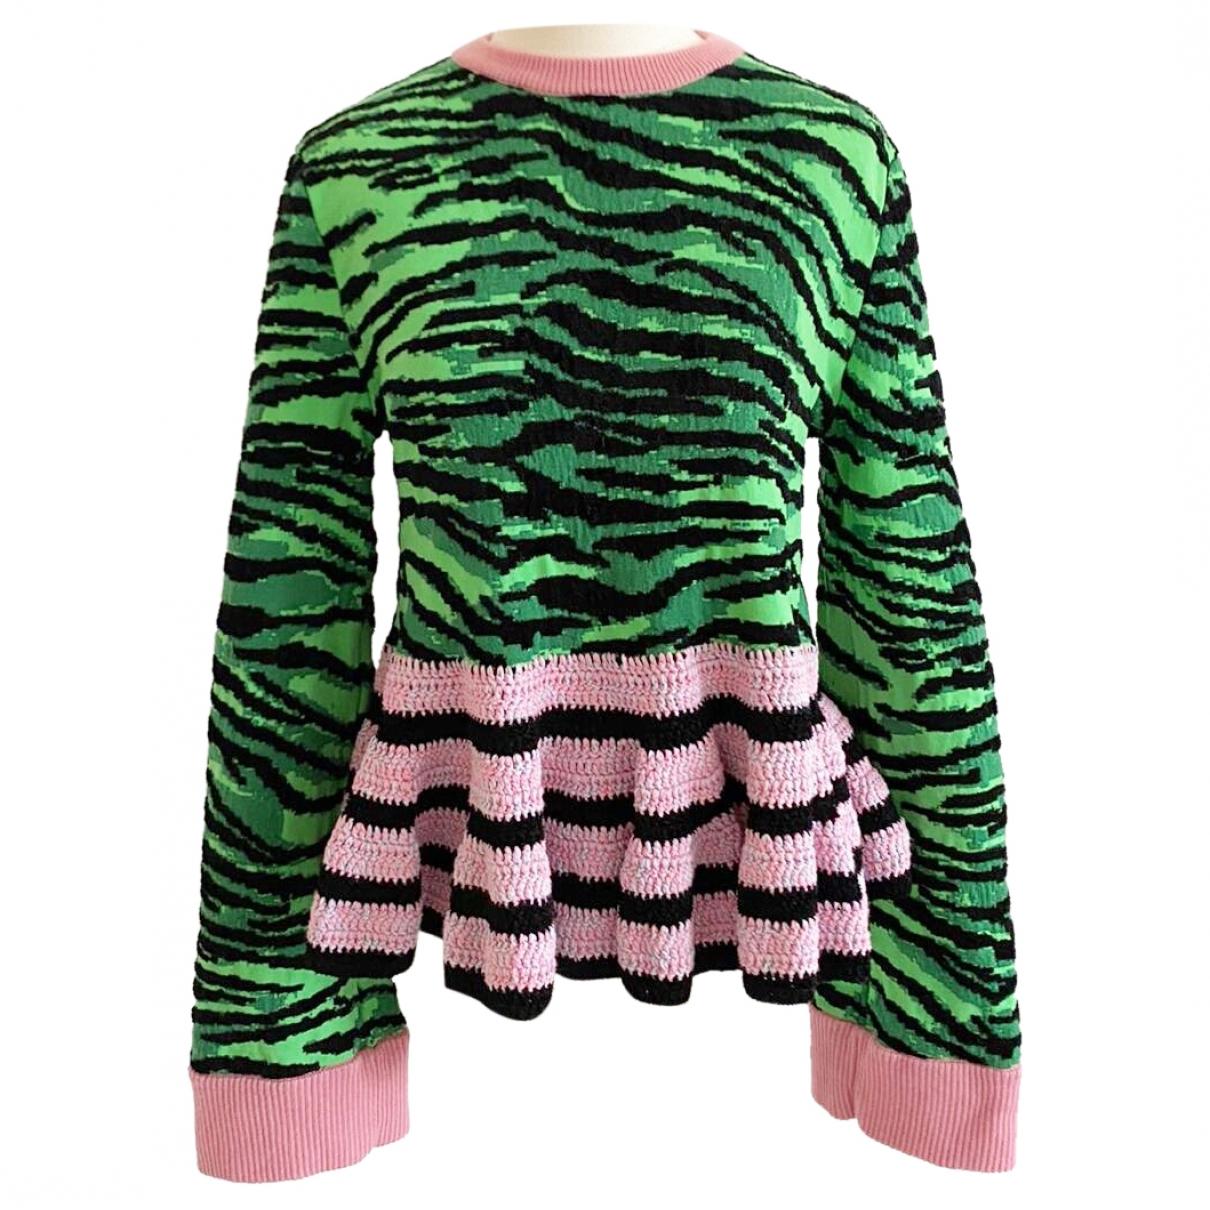 Kenzo X H&m \N Green Cotton Knitwear for Women S International